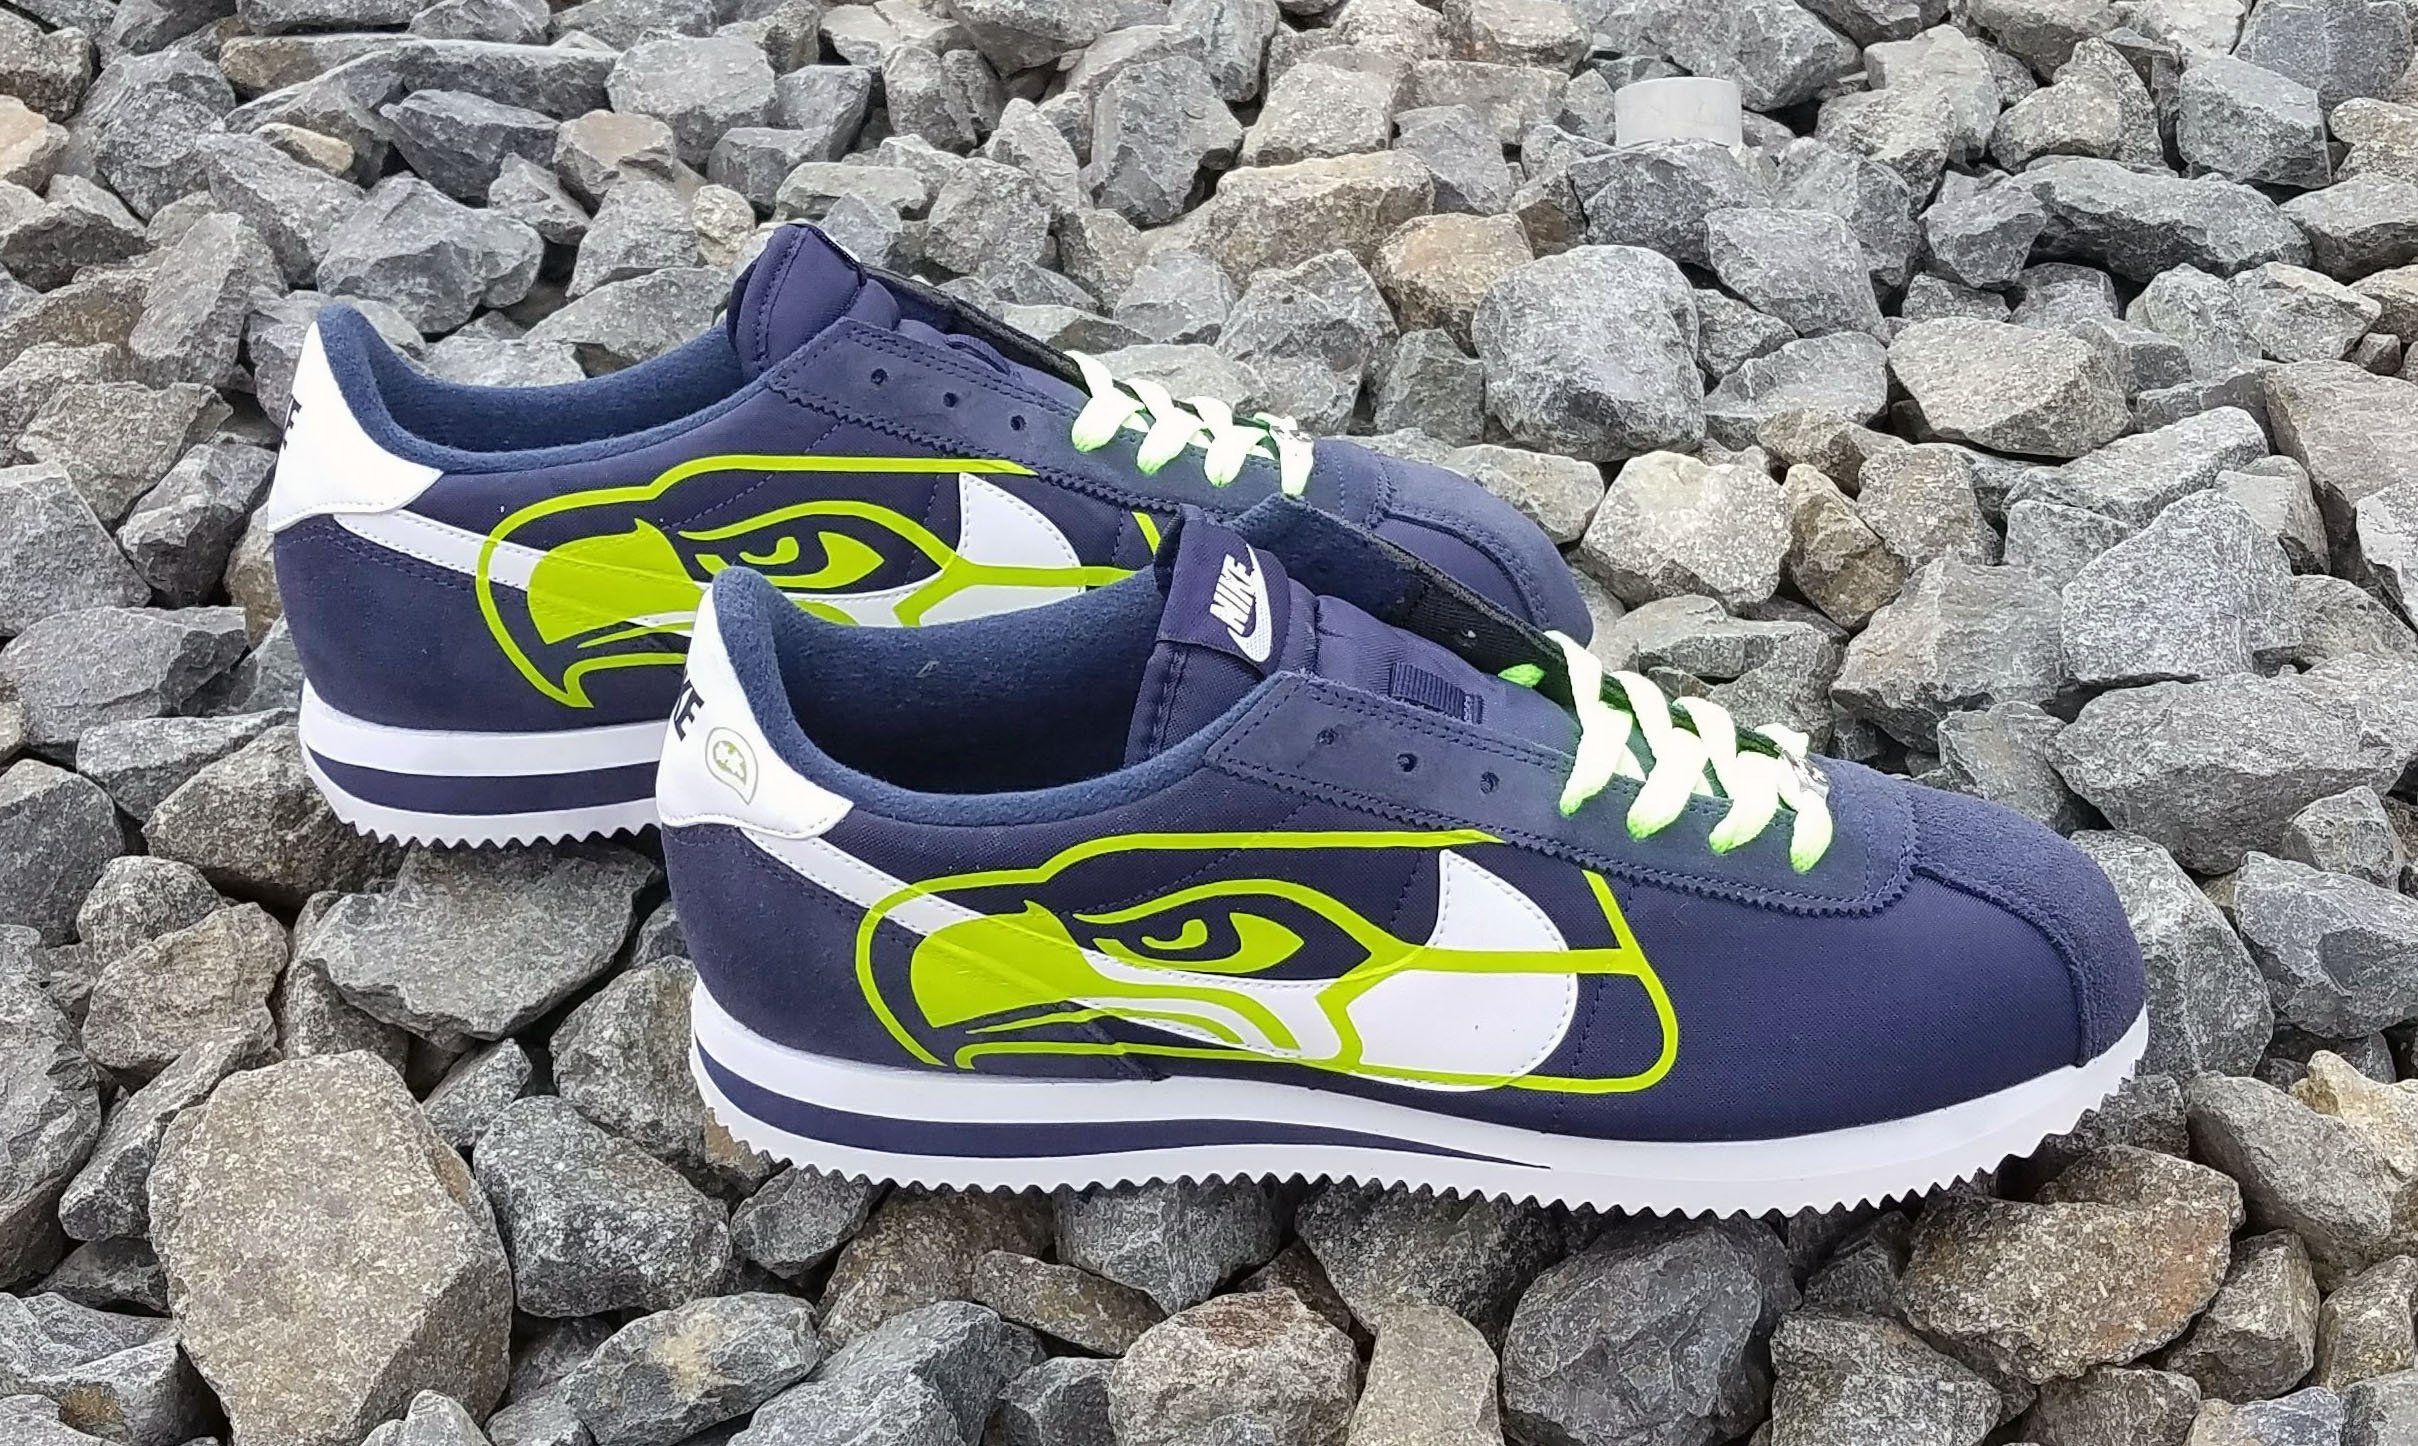 2a3b813f Bandana Fever Lime Seattle Seahawks Big Print Custom Navy/White Nike Cortez  Shoes #sneakers #airmax90 #customizedshoes #kicks #sportswear ...